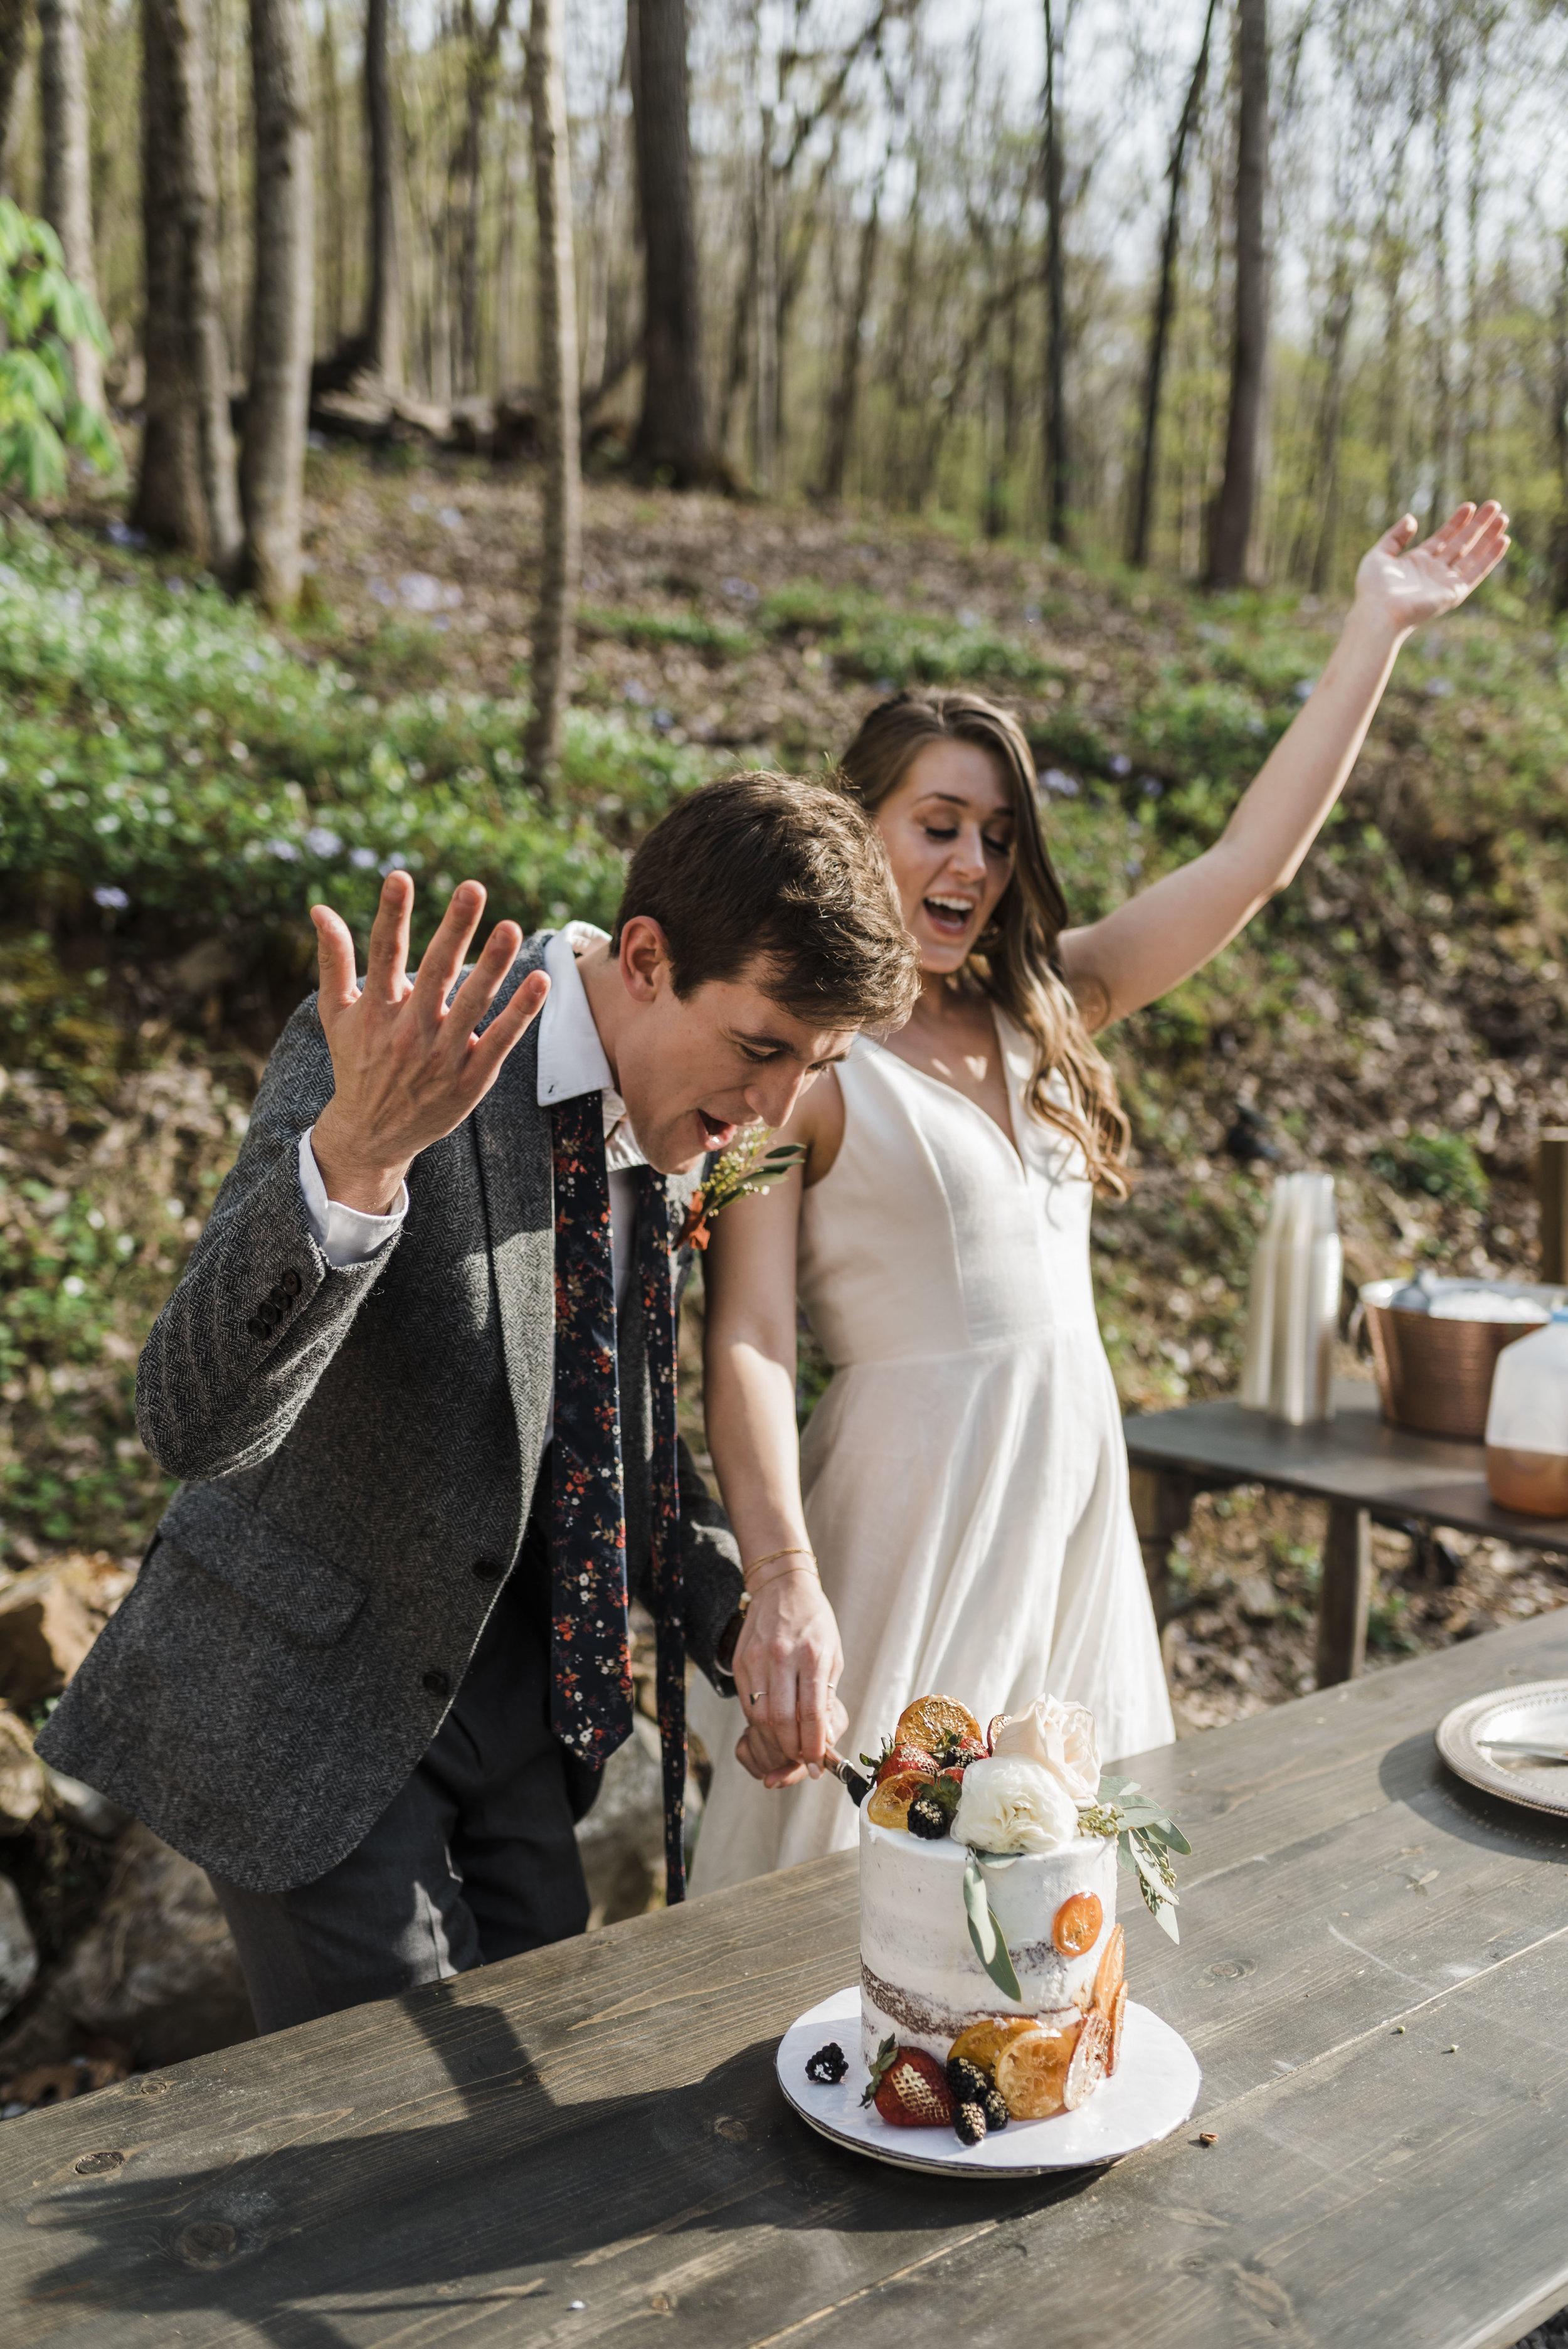 edding bride groom couple cake cutting chattanooga Tennessee